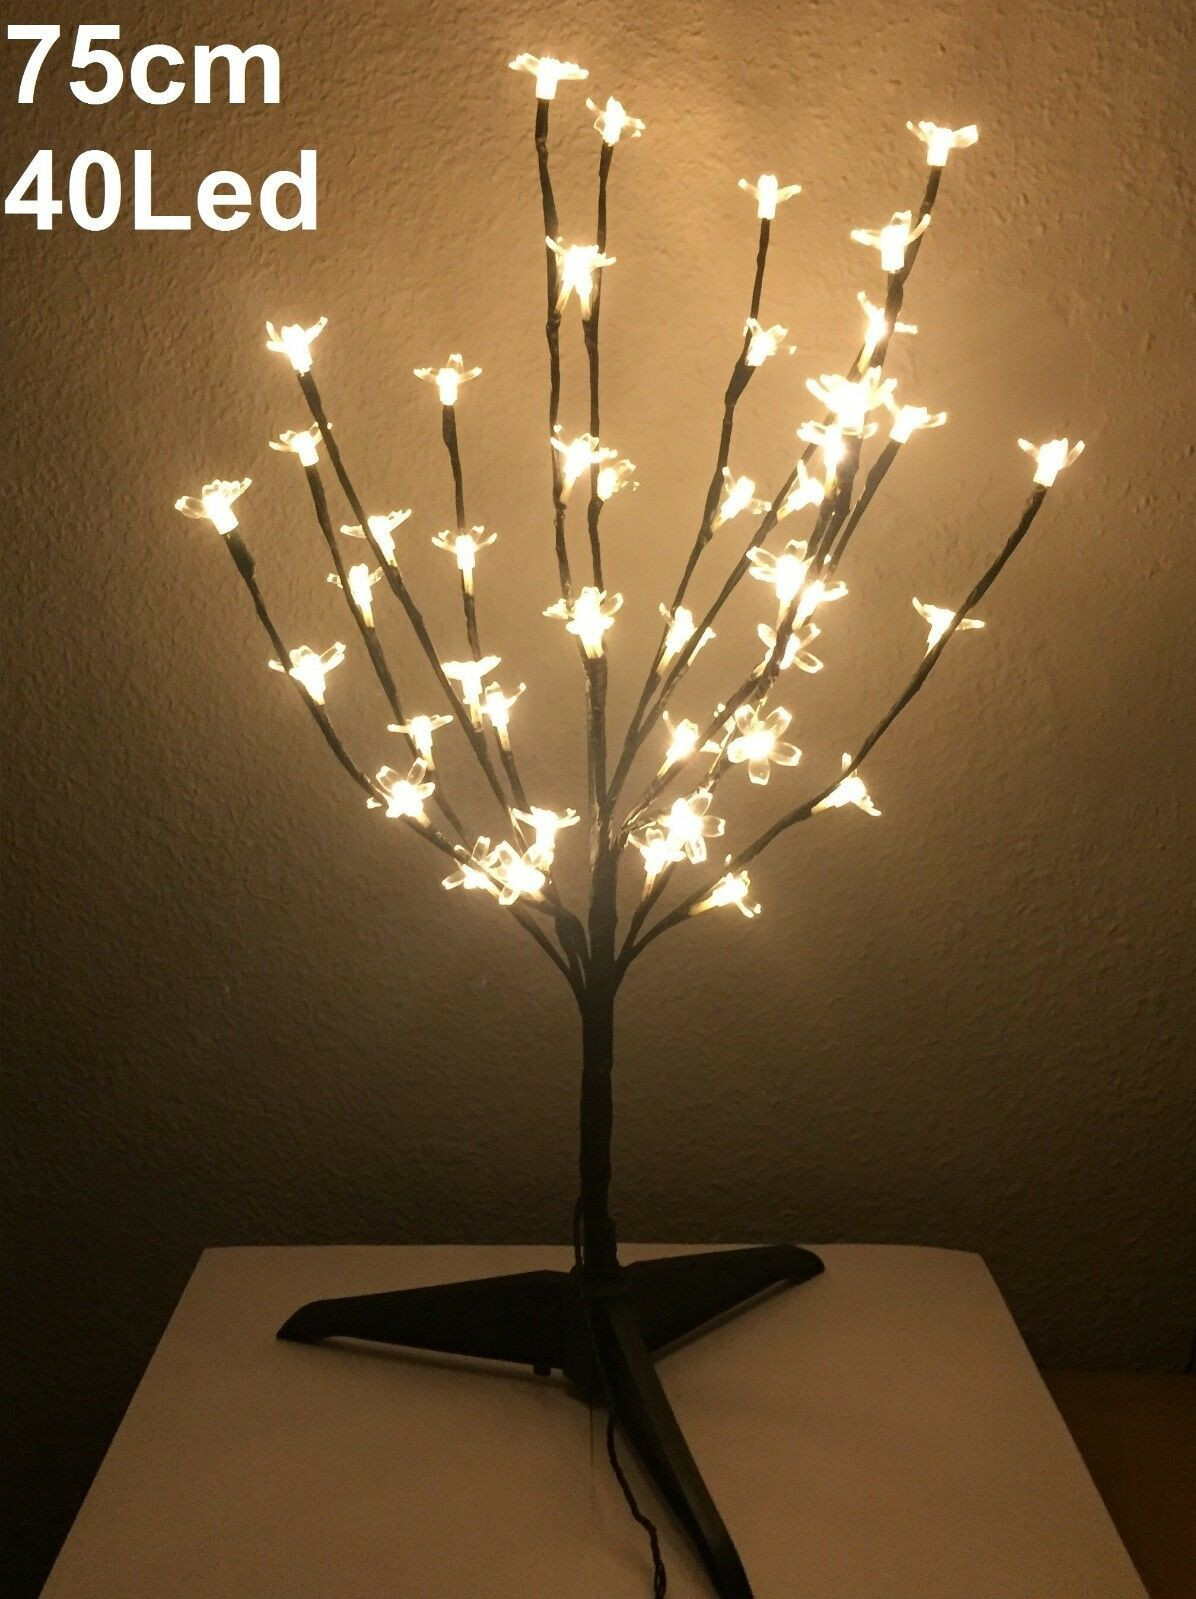 Arbol de navidad con luces led 75cm 40 leds cerezo decorativo árbol...